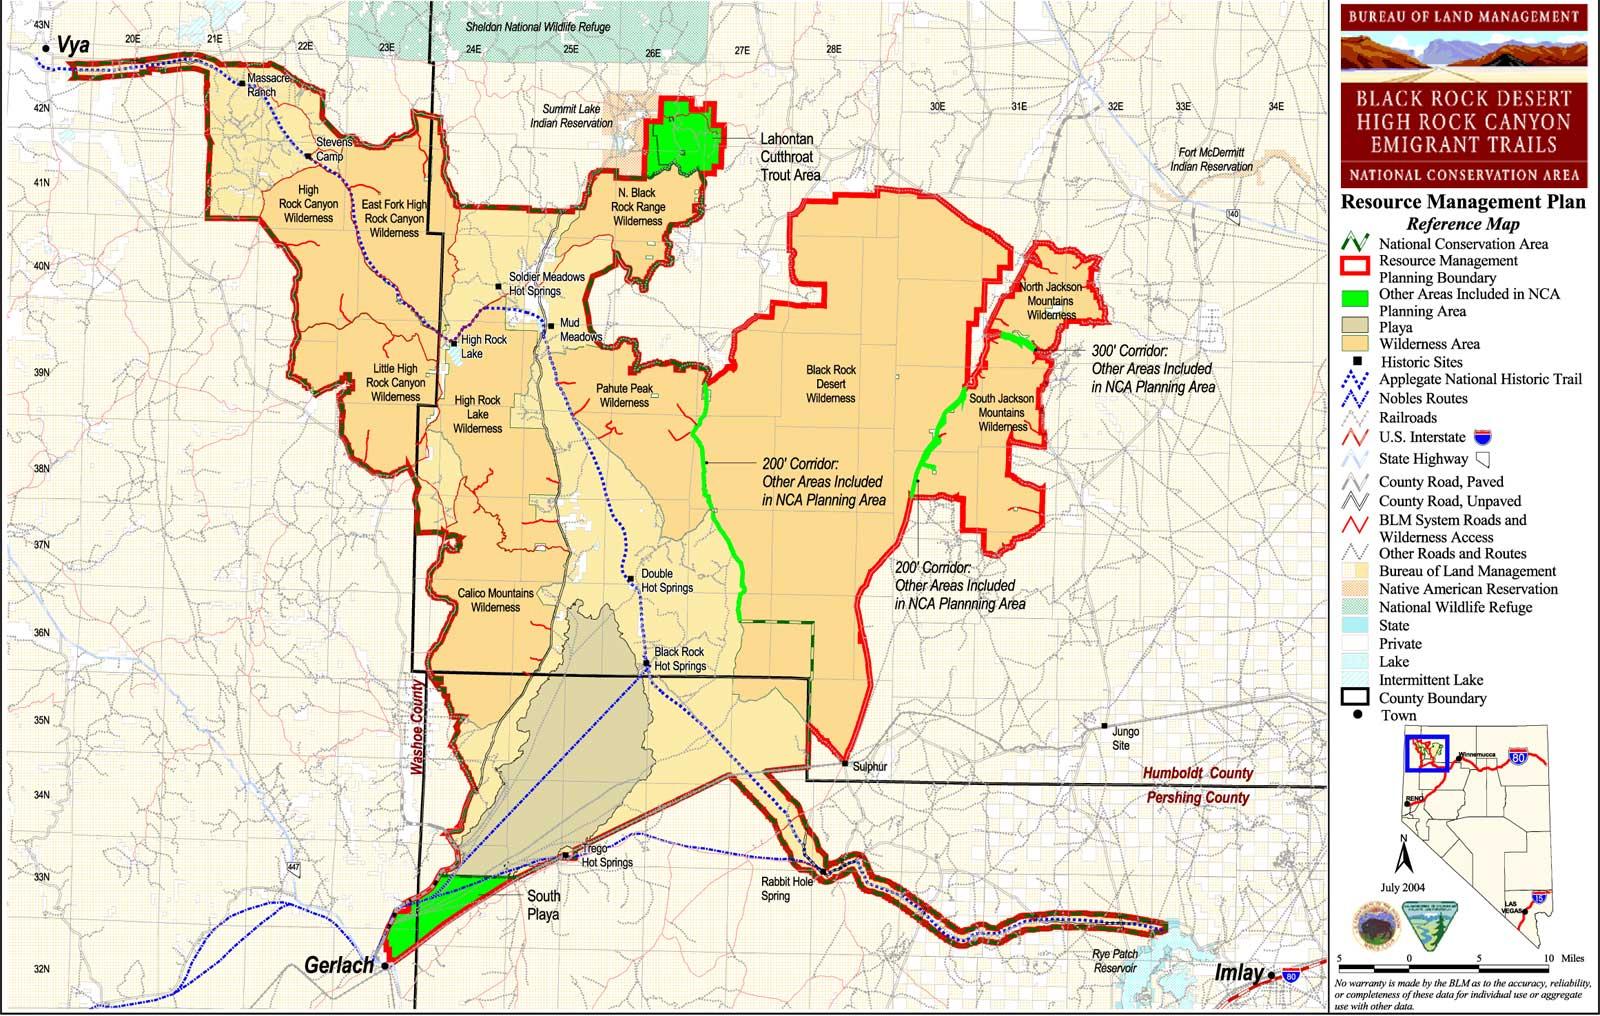 Black Rock Desert High Rock Canyon Emigrant Trails National Conservation Area Nevada Blm Sites